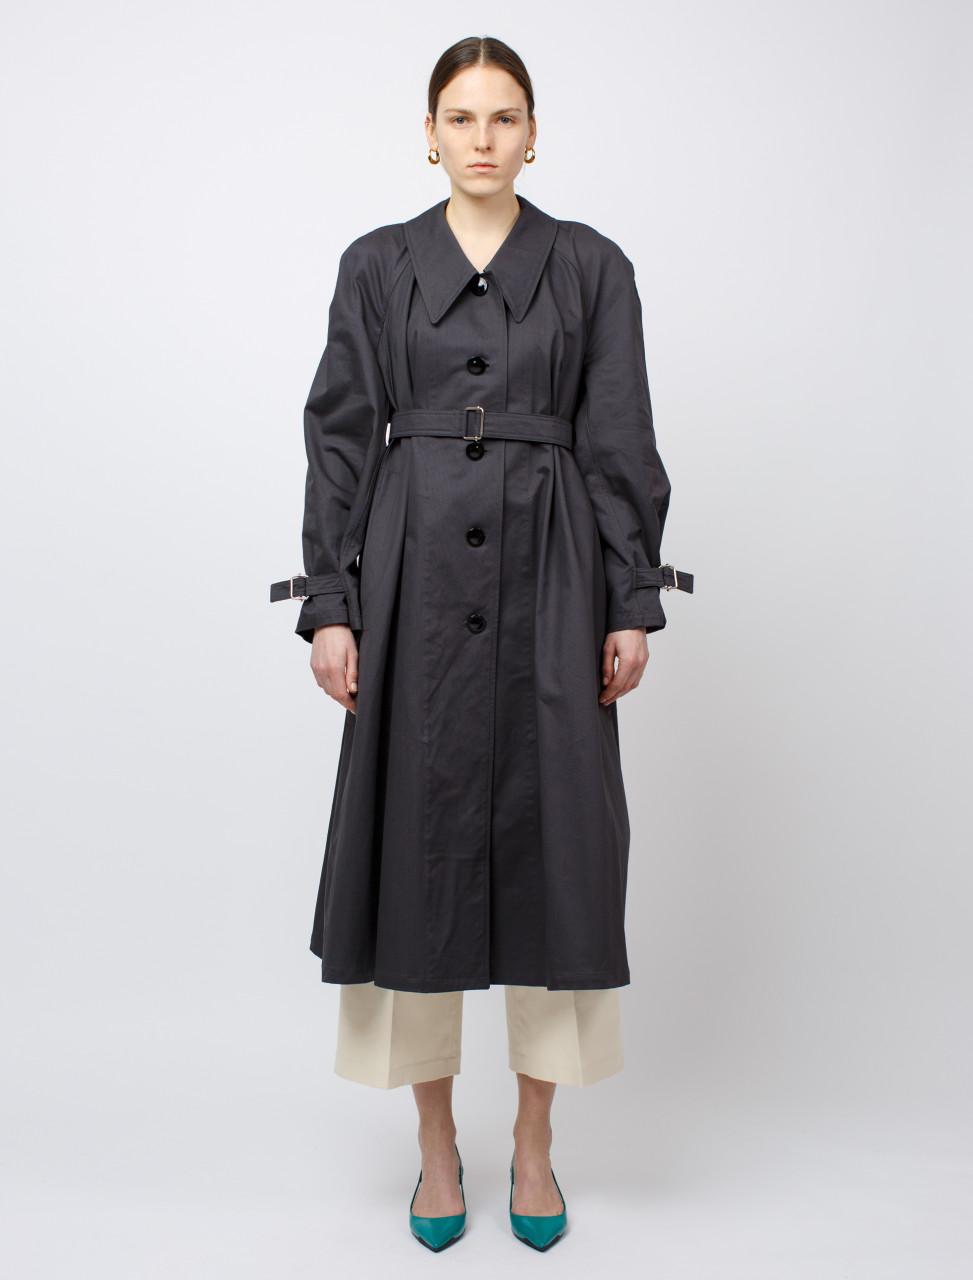 Cotton Overcoat